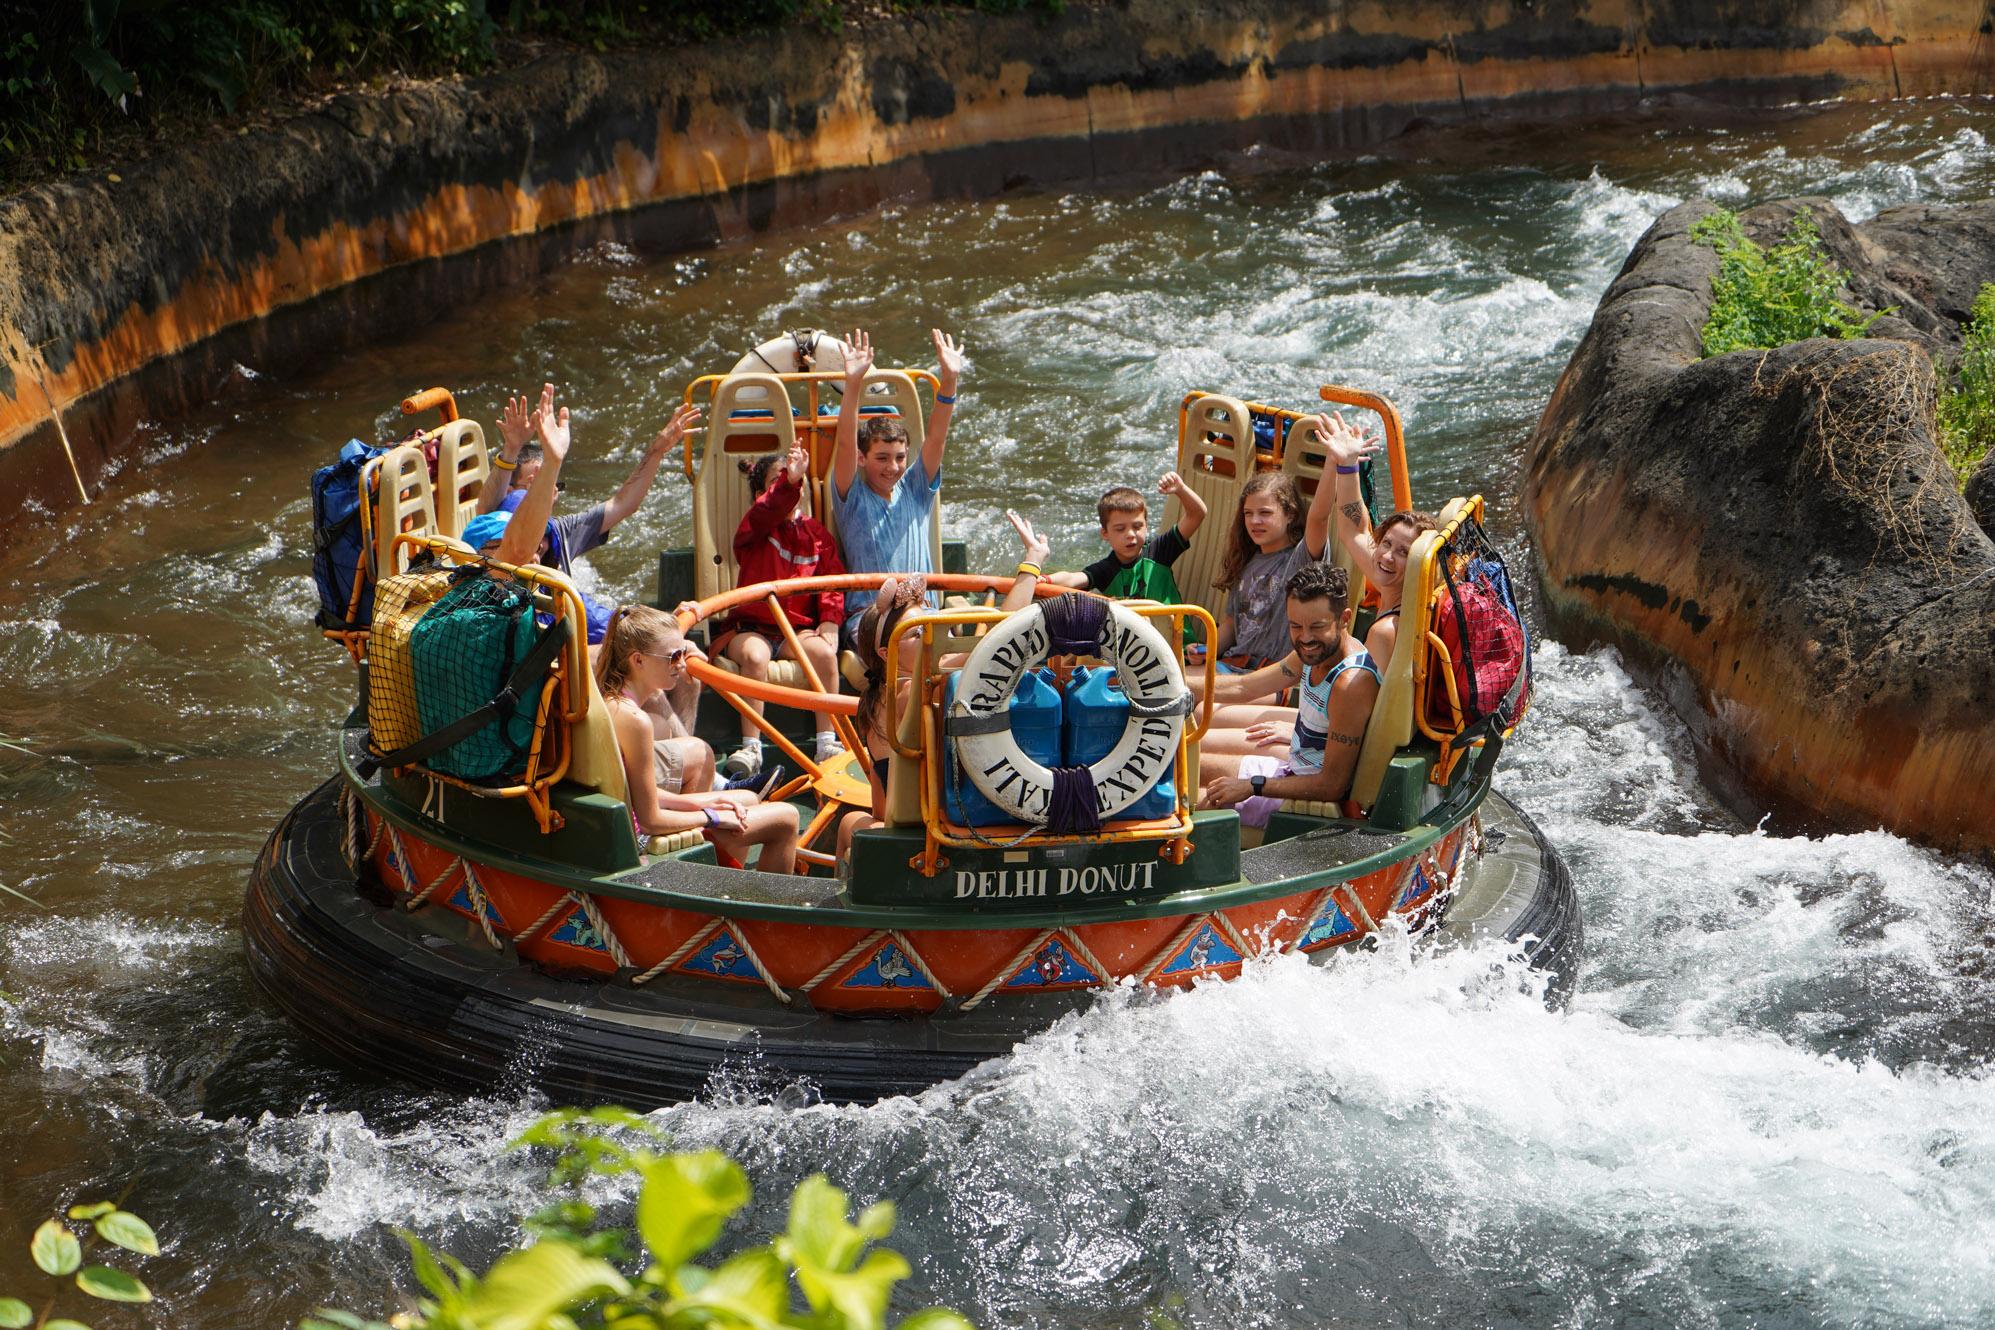 Scool group riding Disney World's Kali River Rapids